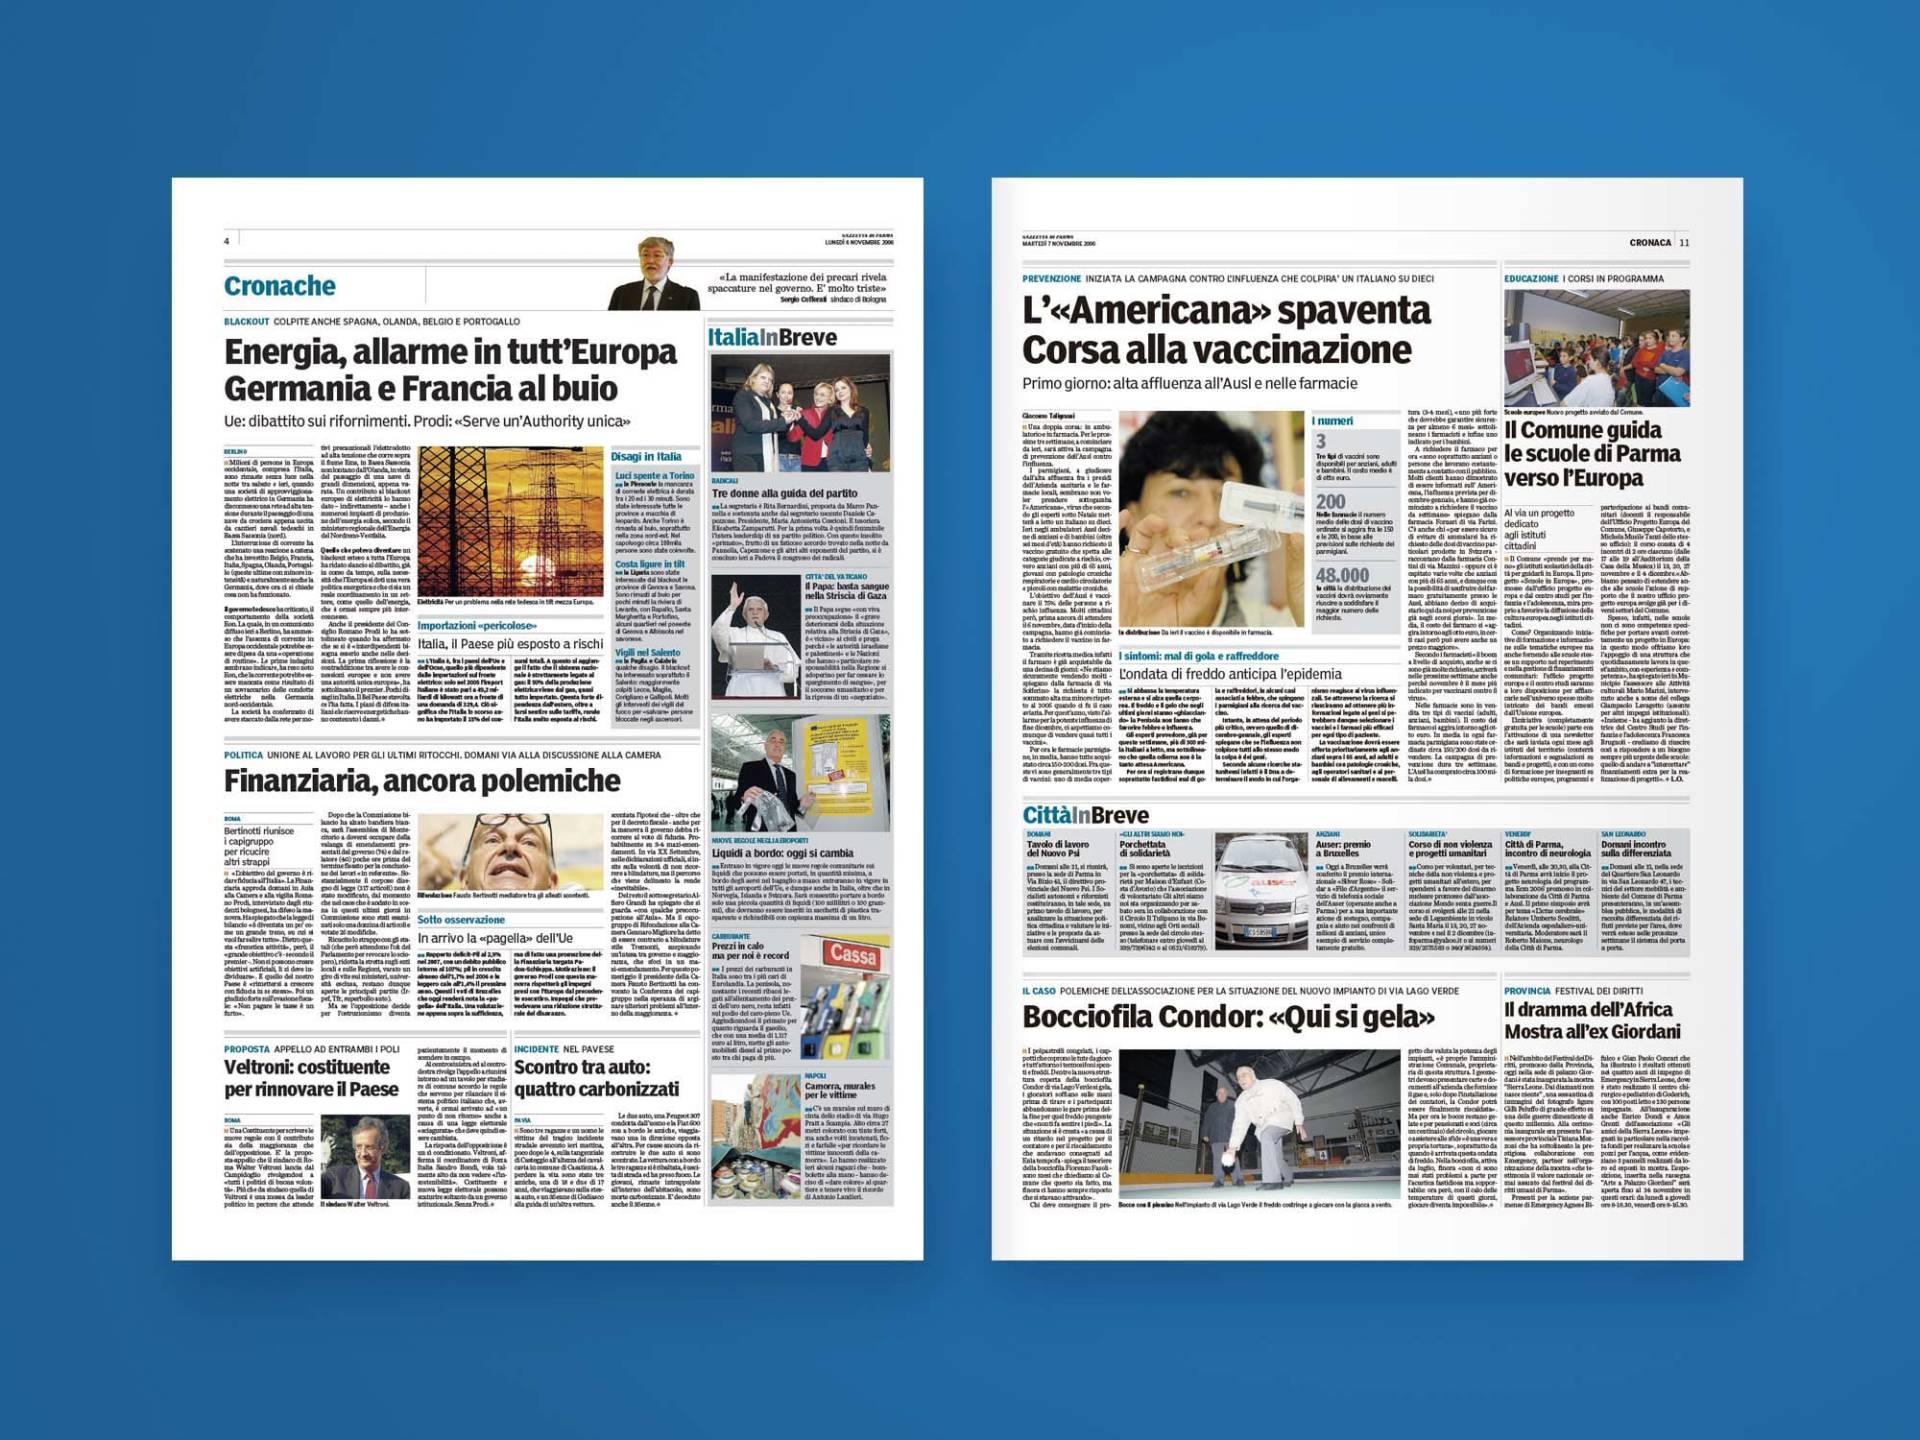 Gazzetta_di_Parma_04_Wenceslau_News_Design